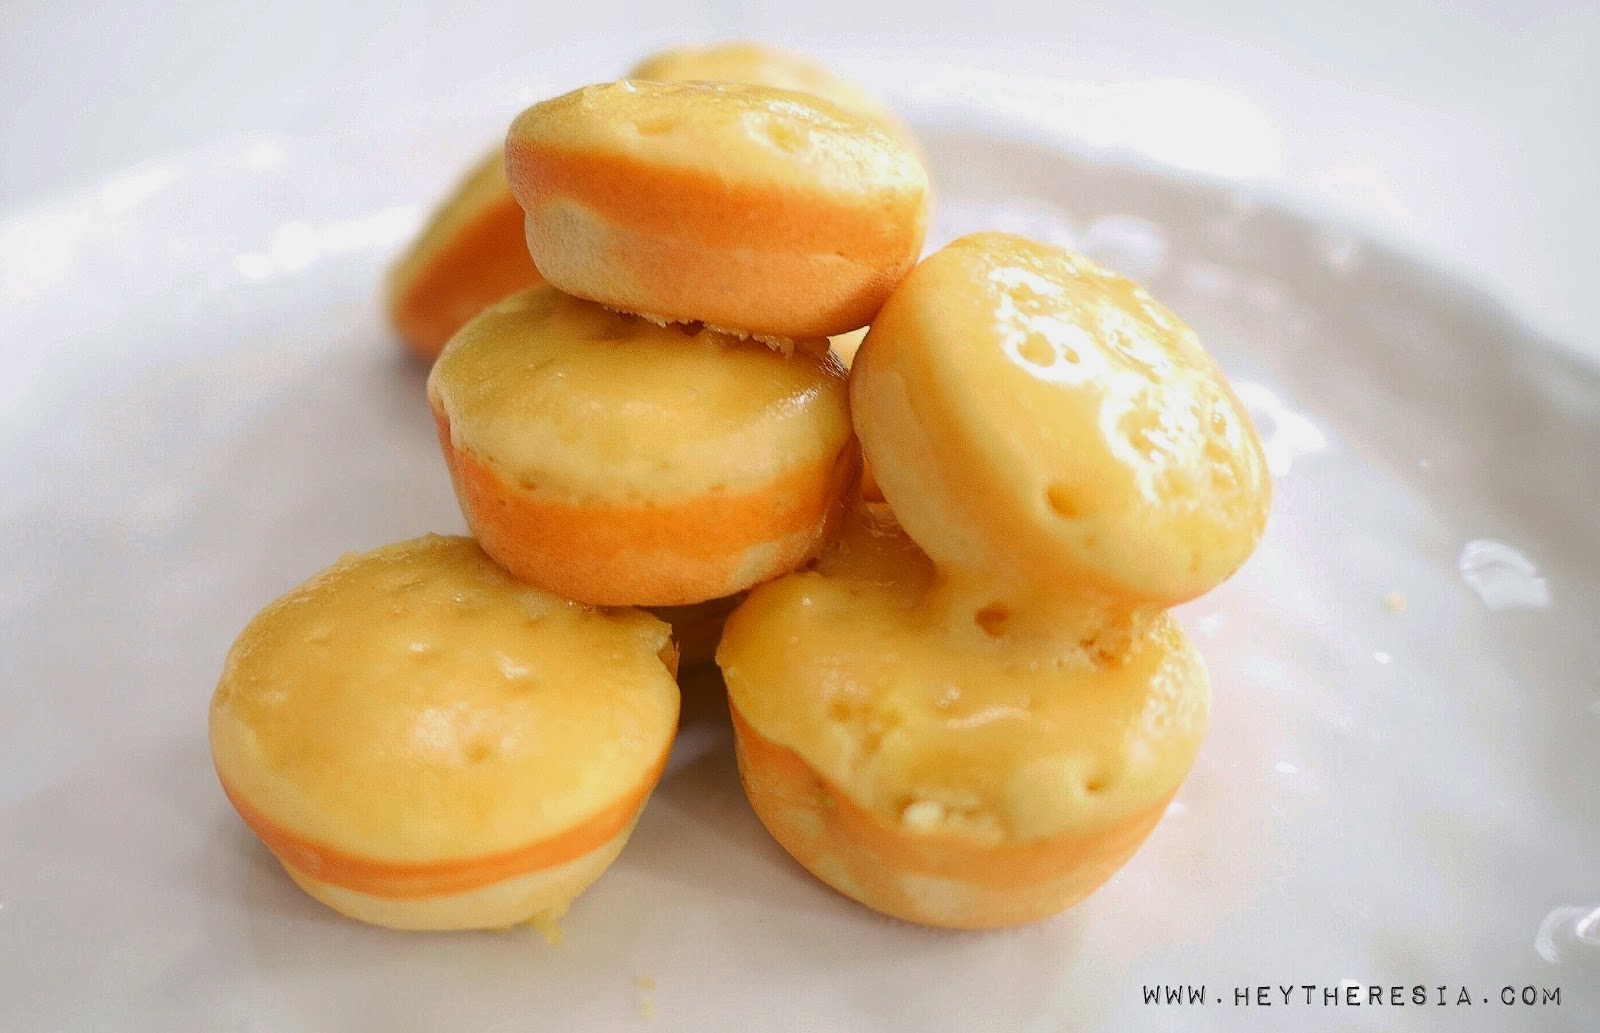 Heytheresia indonesian food travel blogger easy recipe resep kue cubit setengah matang forumfinder Gallery